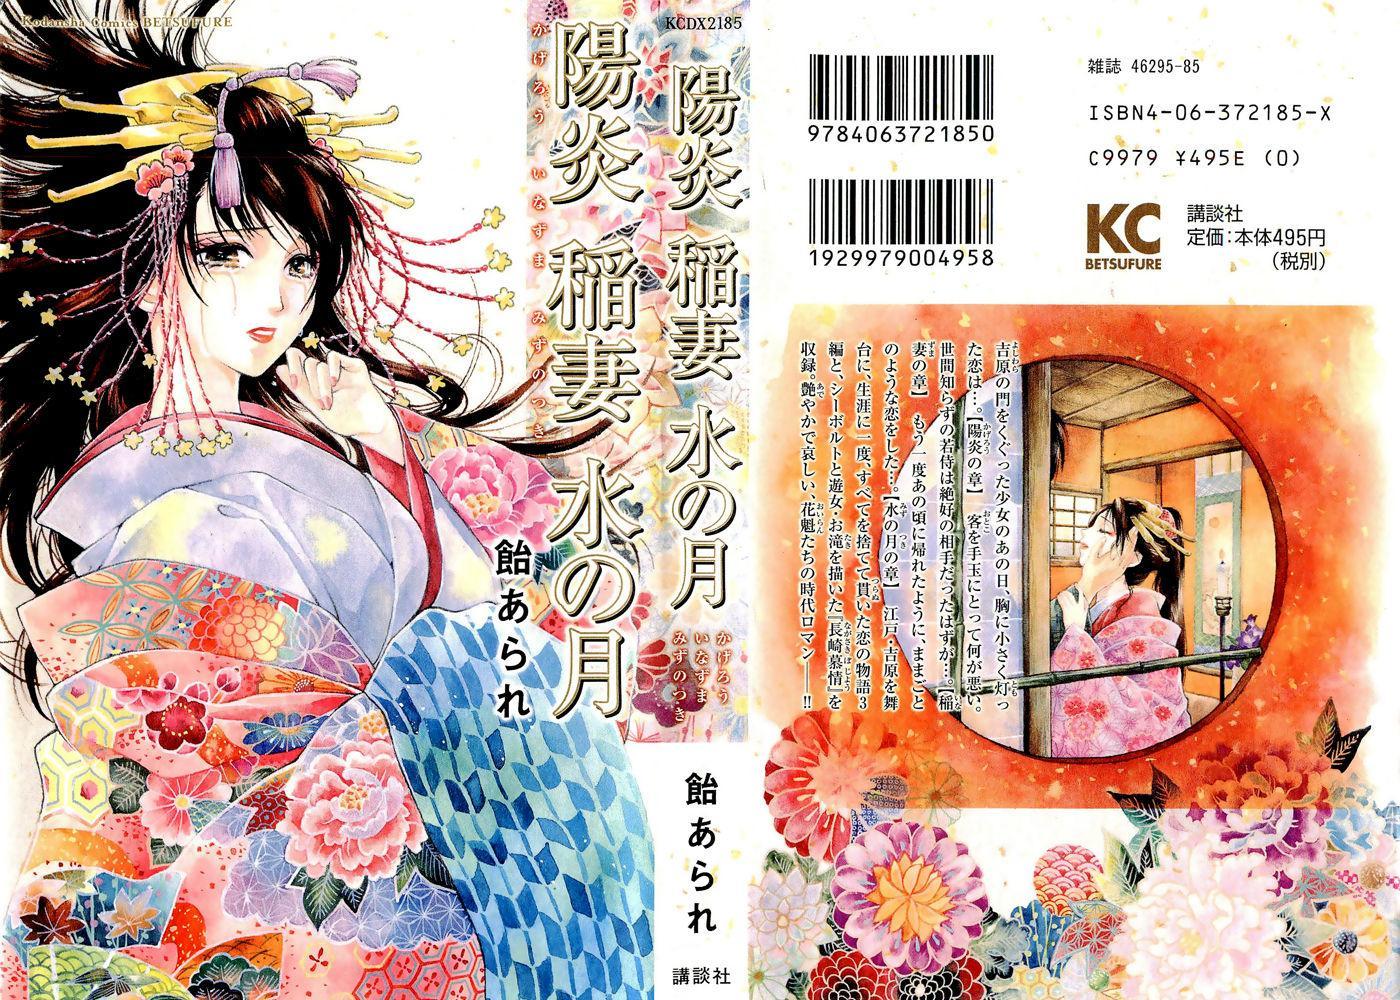 Kagerou Inazuma Mizu No Tsuki Vol.1 Ch.1 page 1 at www.Mangago.com